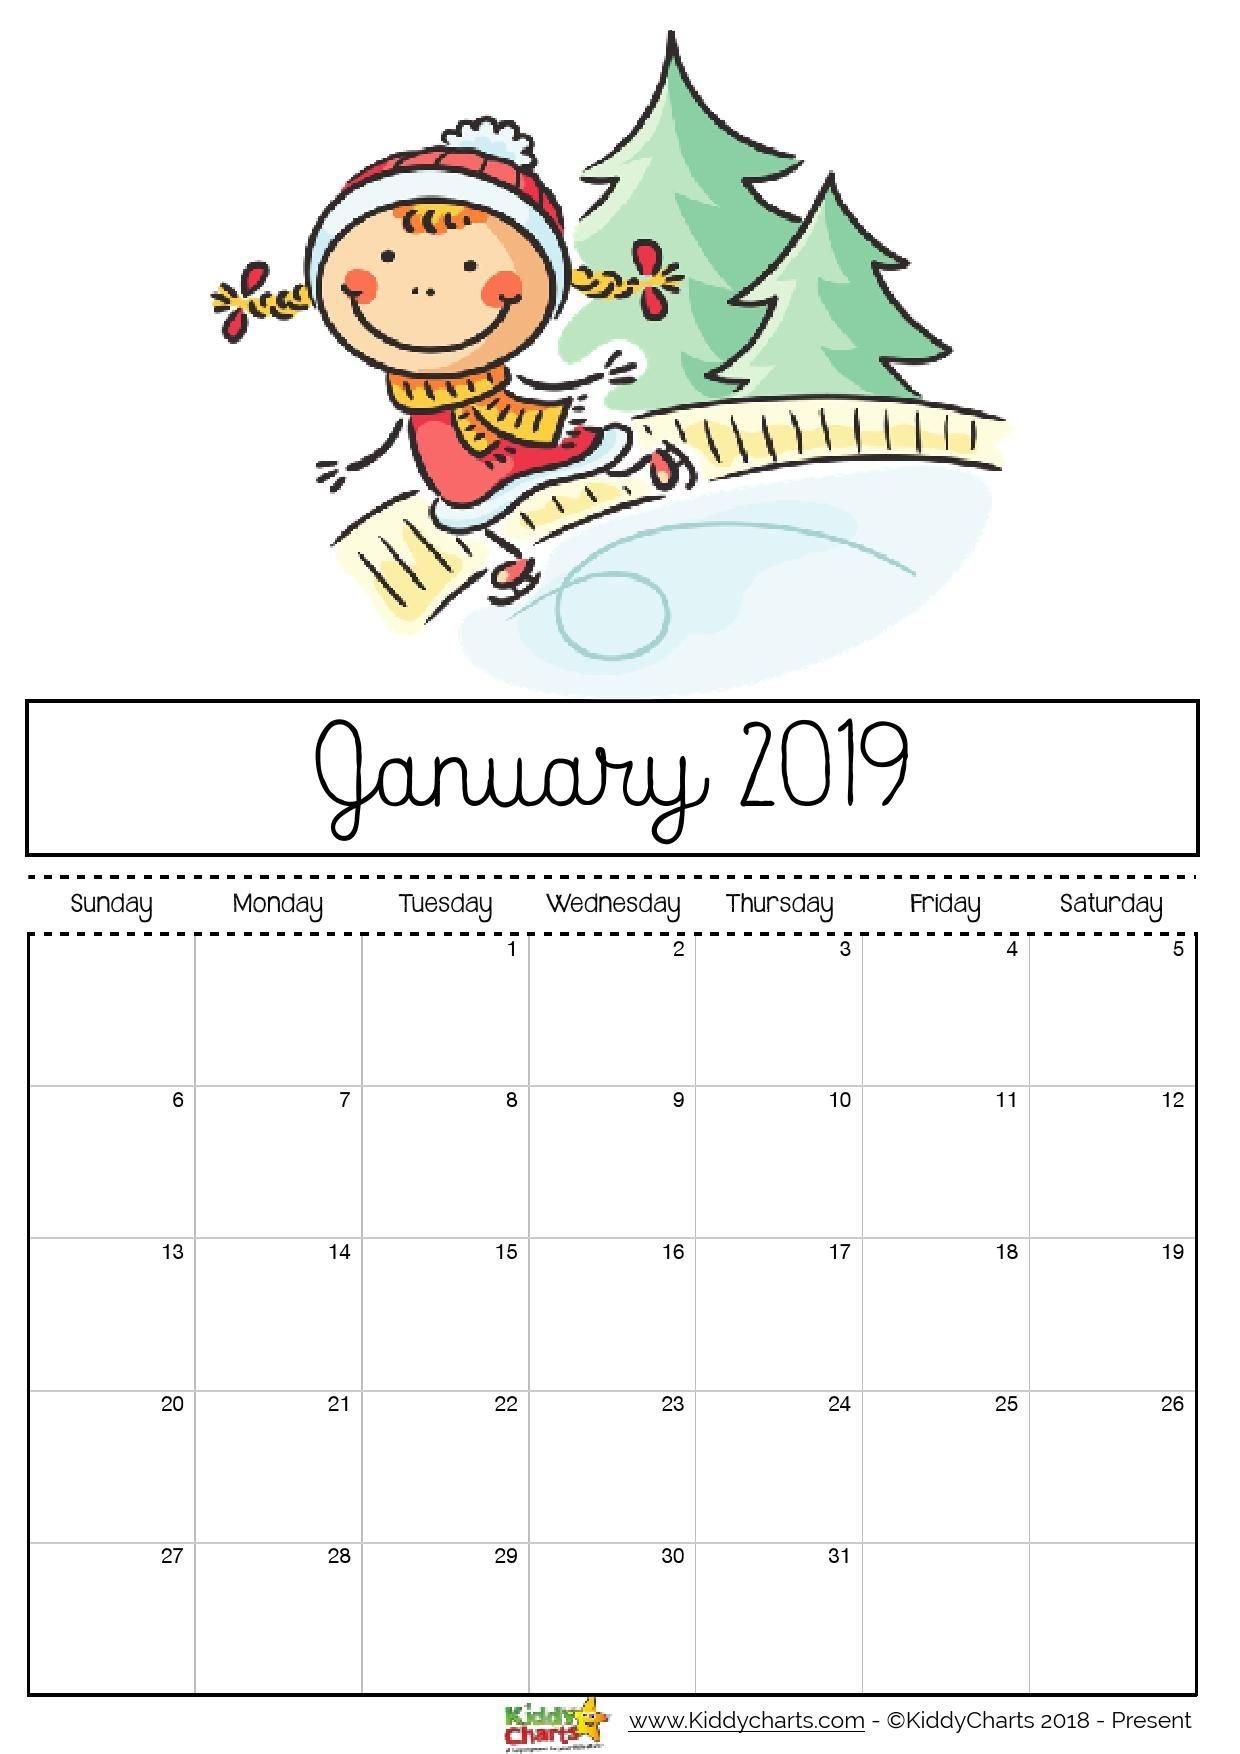 Free Printable 2019 Calendar - Print Yours Here | Planner | Print Calendar 2019 Girly